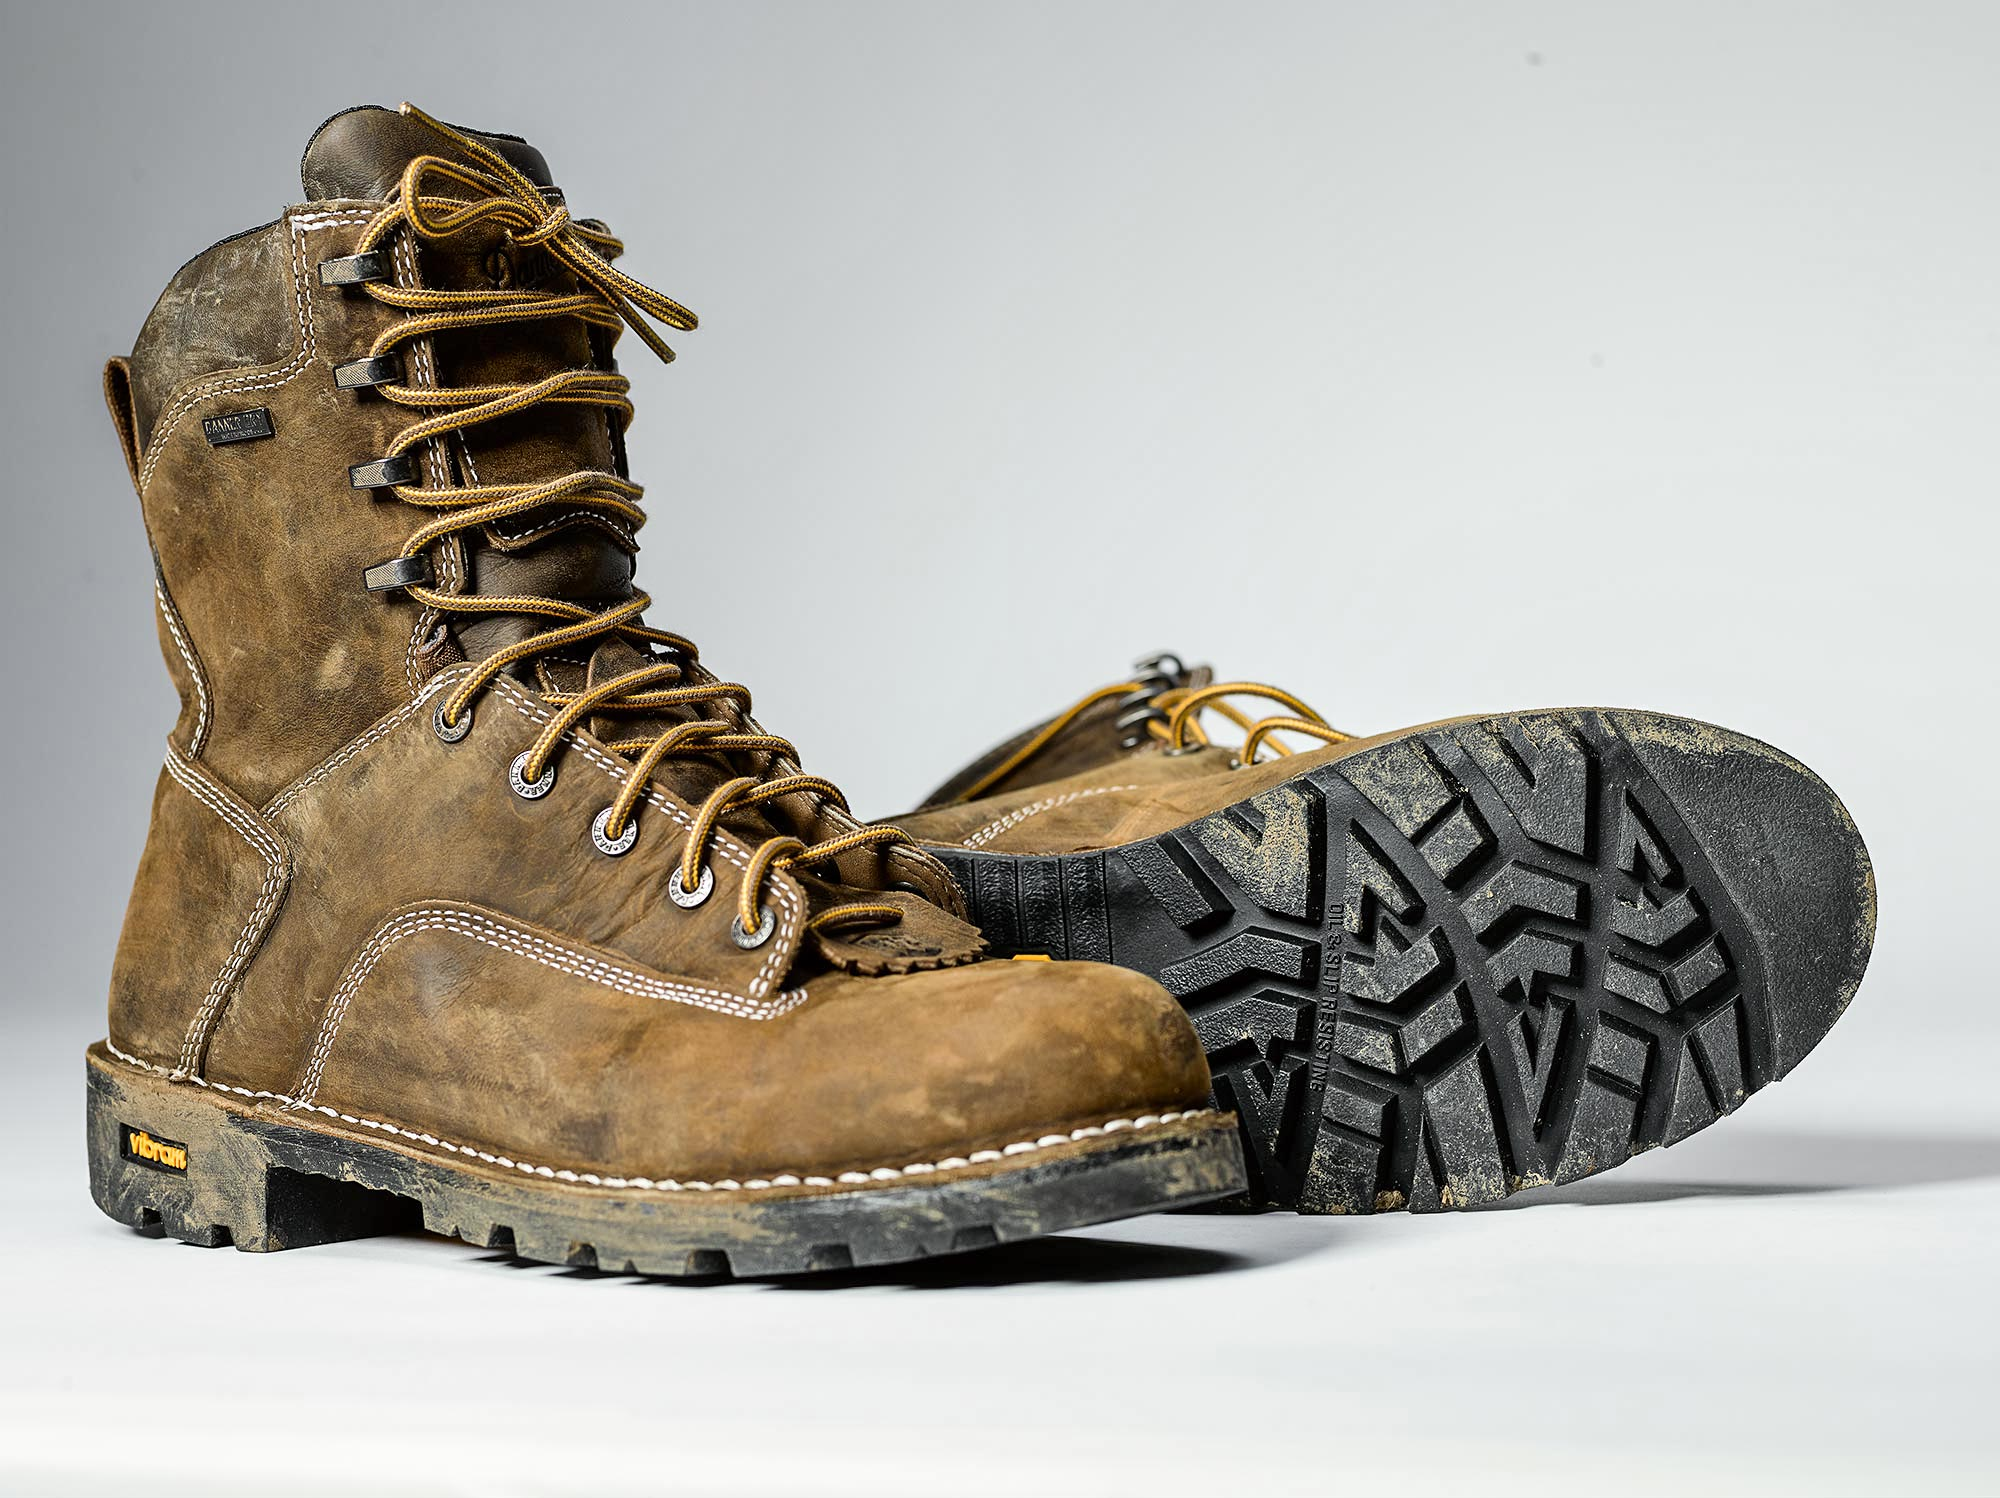 Danner_Boots.jpg